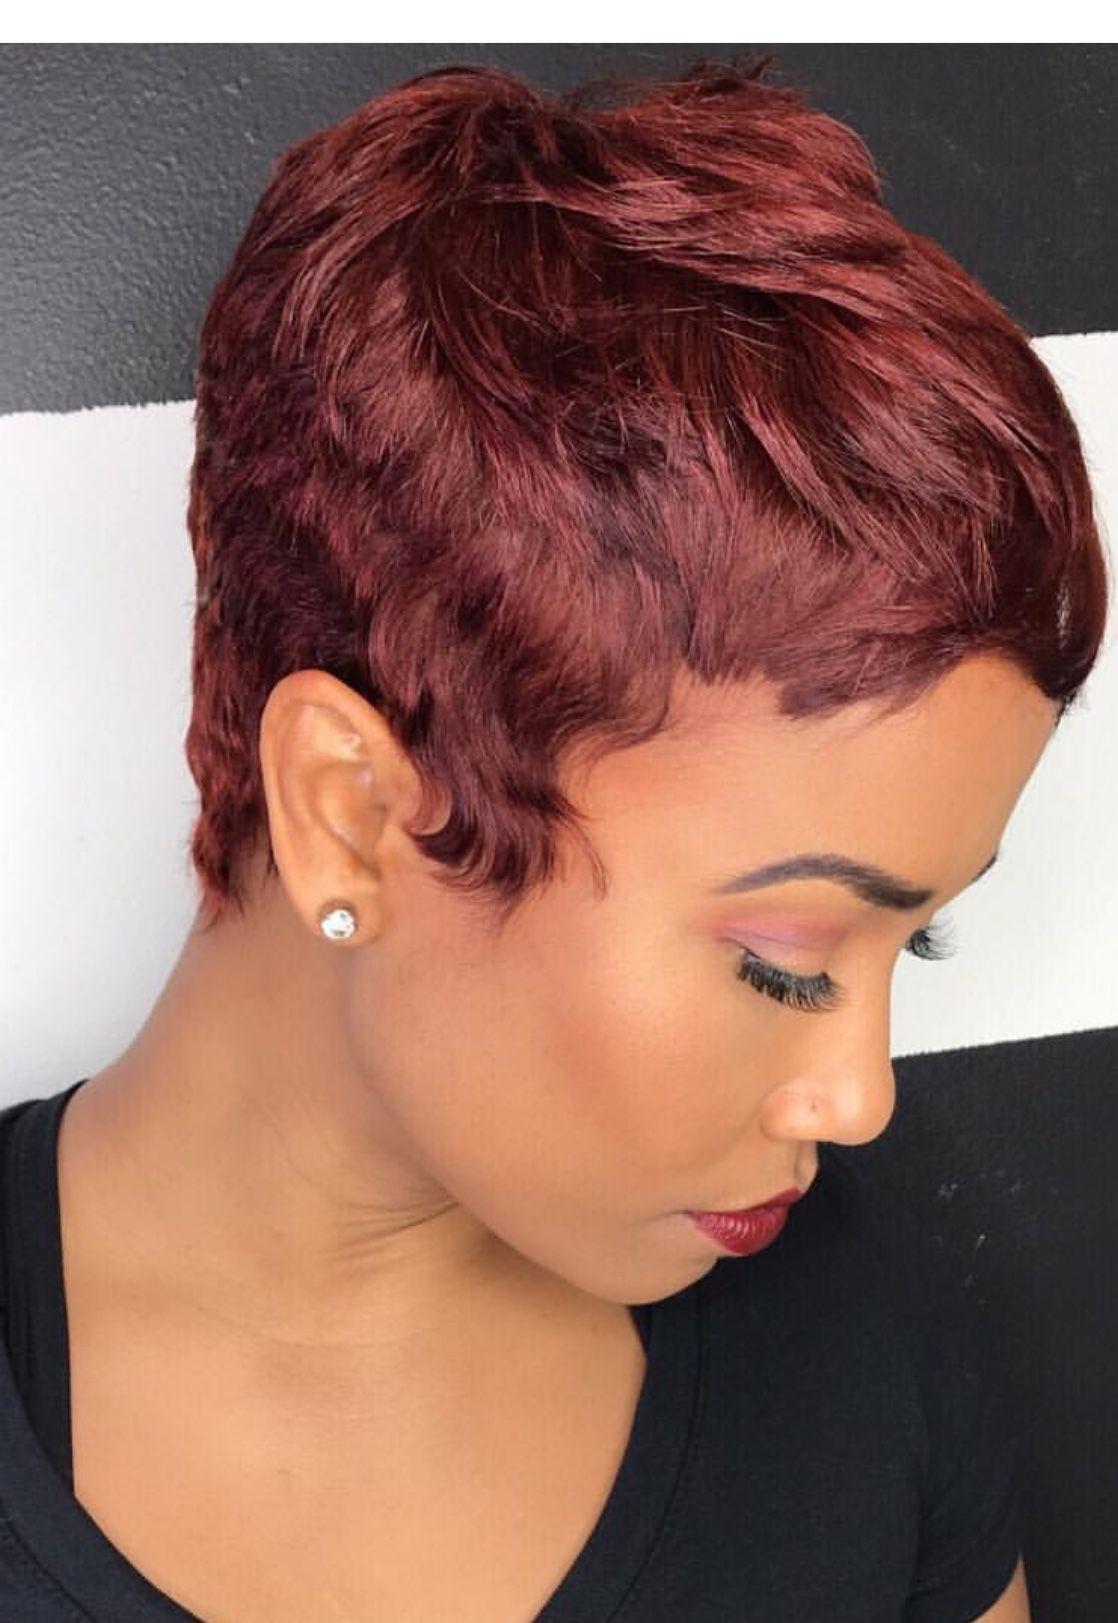 Pin by latoya carter on headin to hairdresser in pinterest